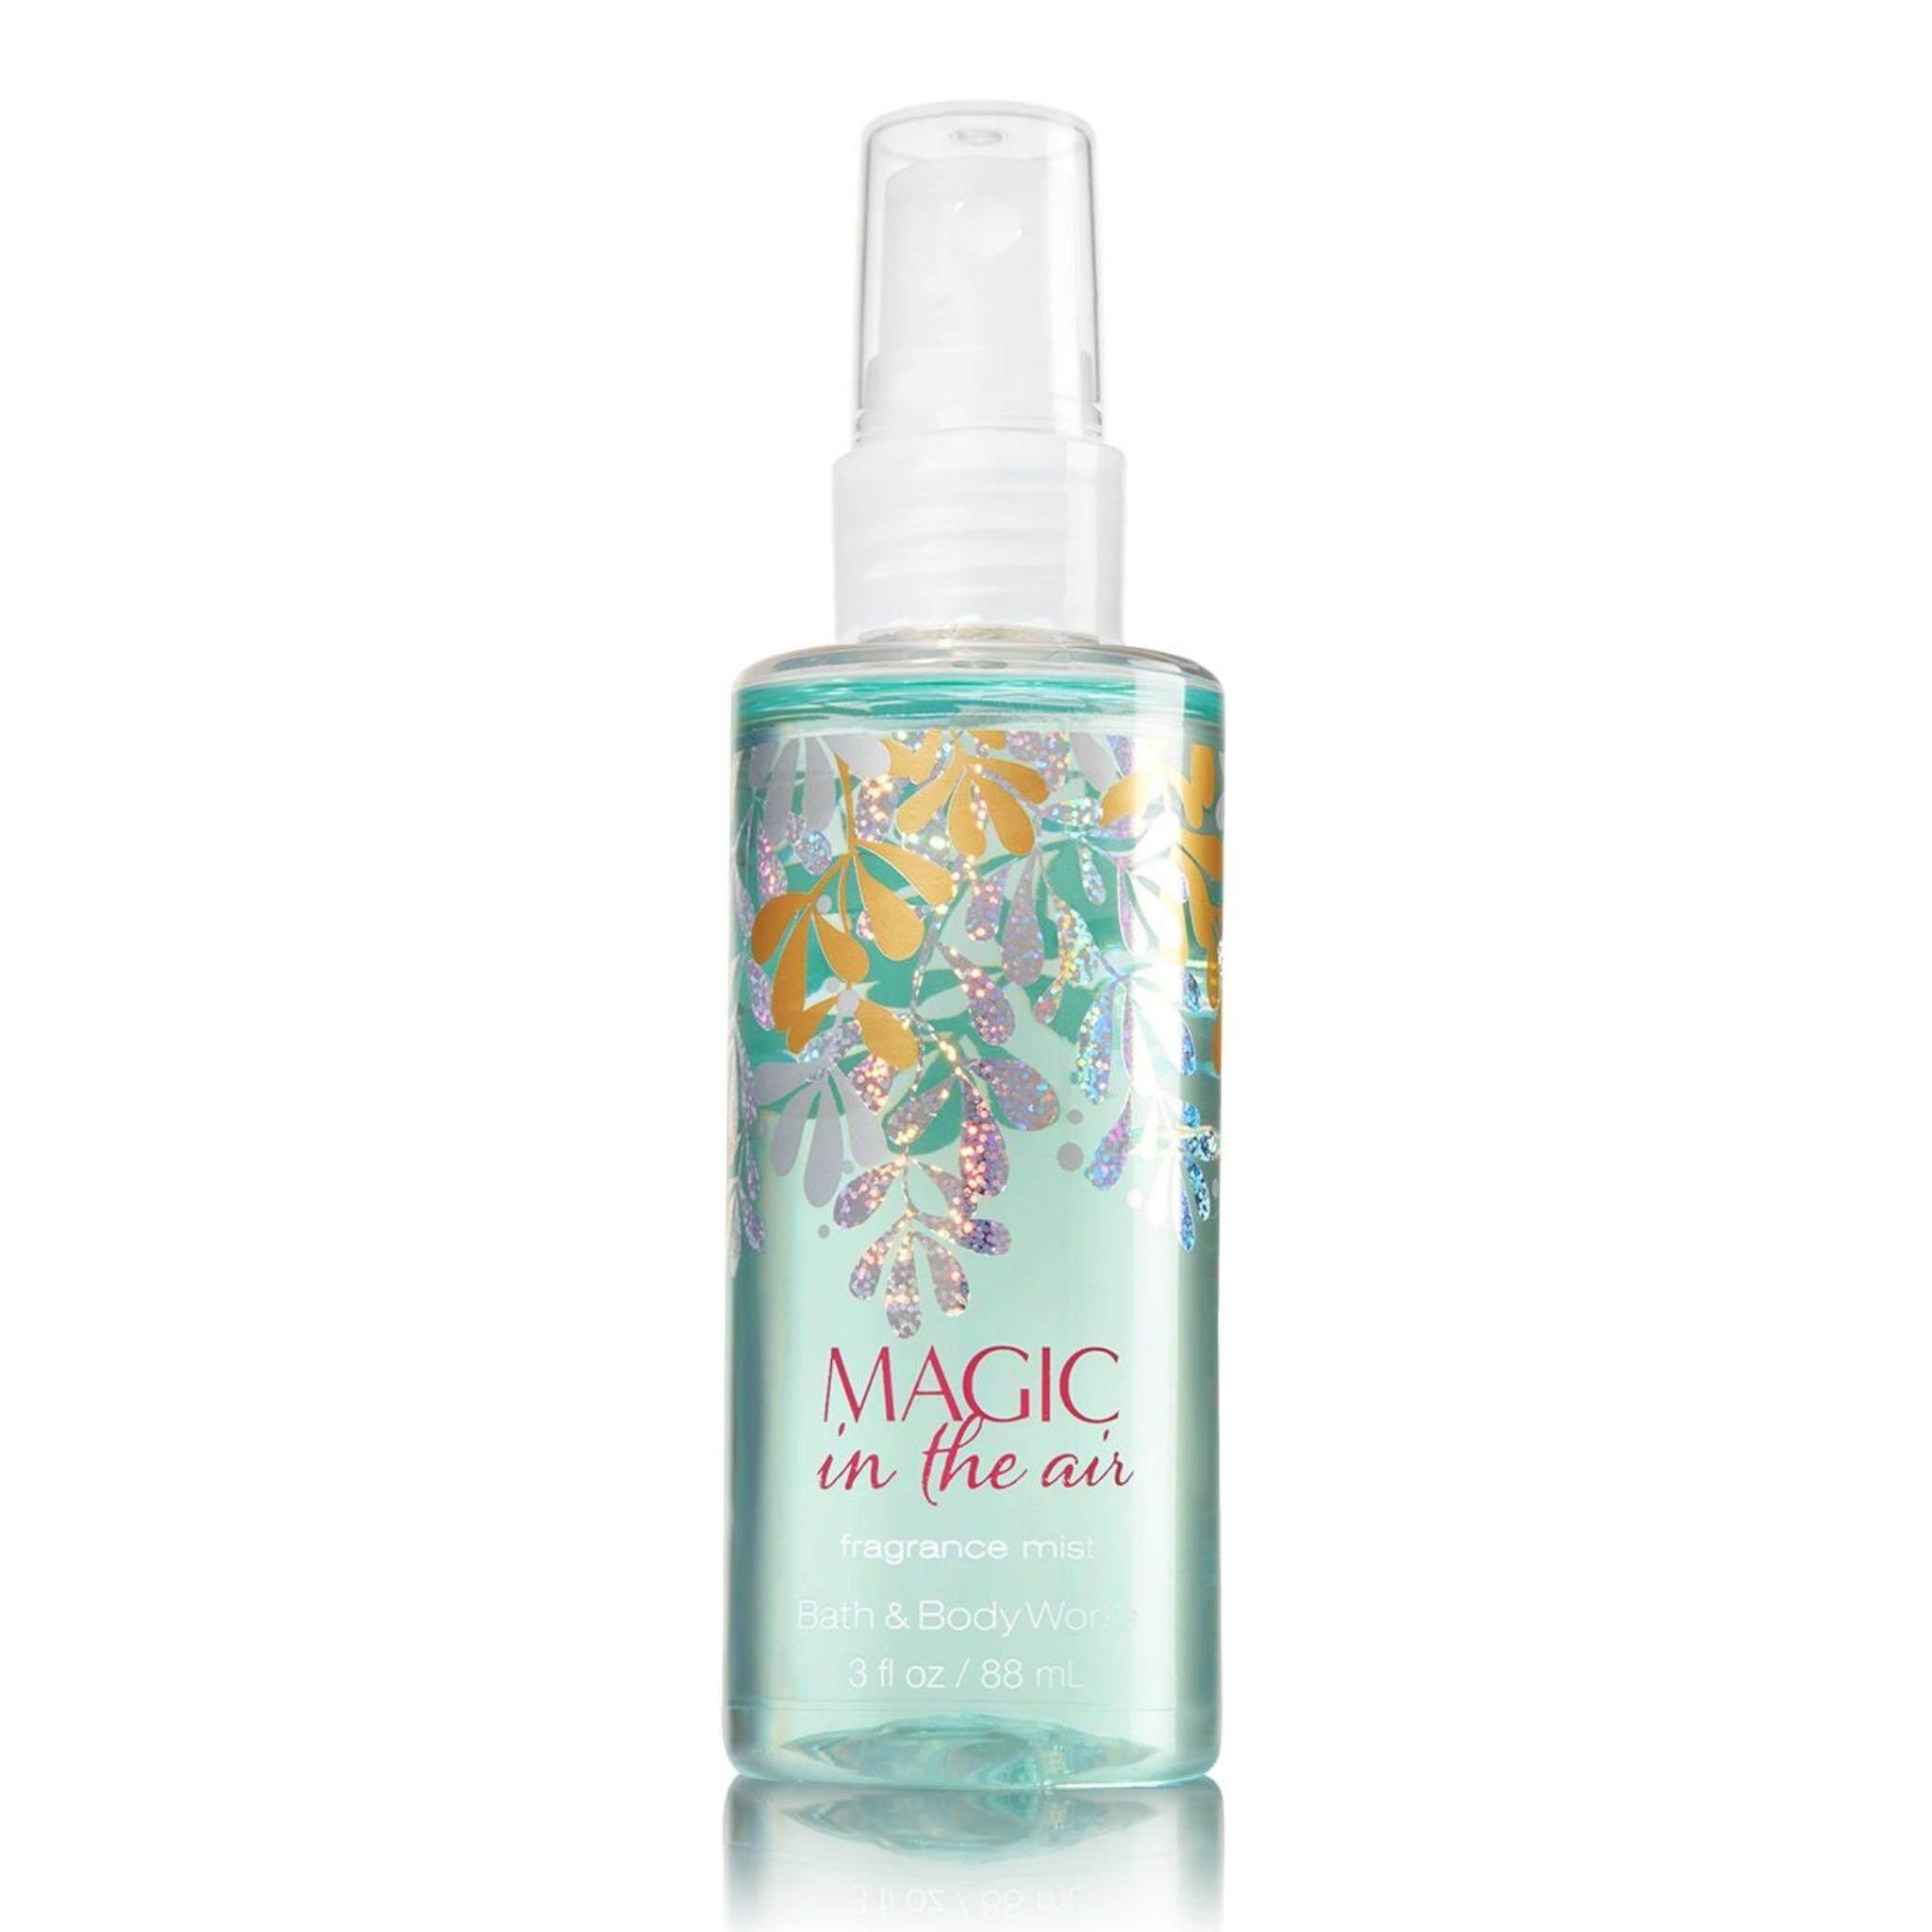 Bath Body Works Magic In The Air Mist